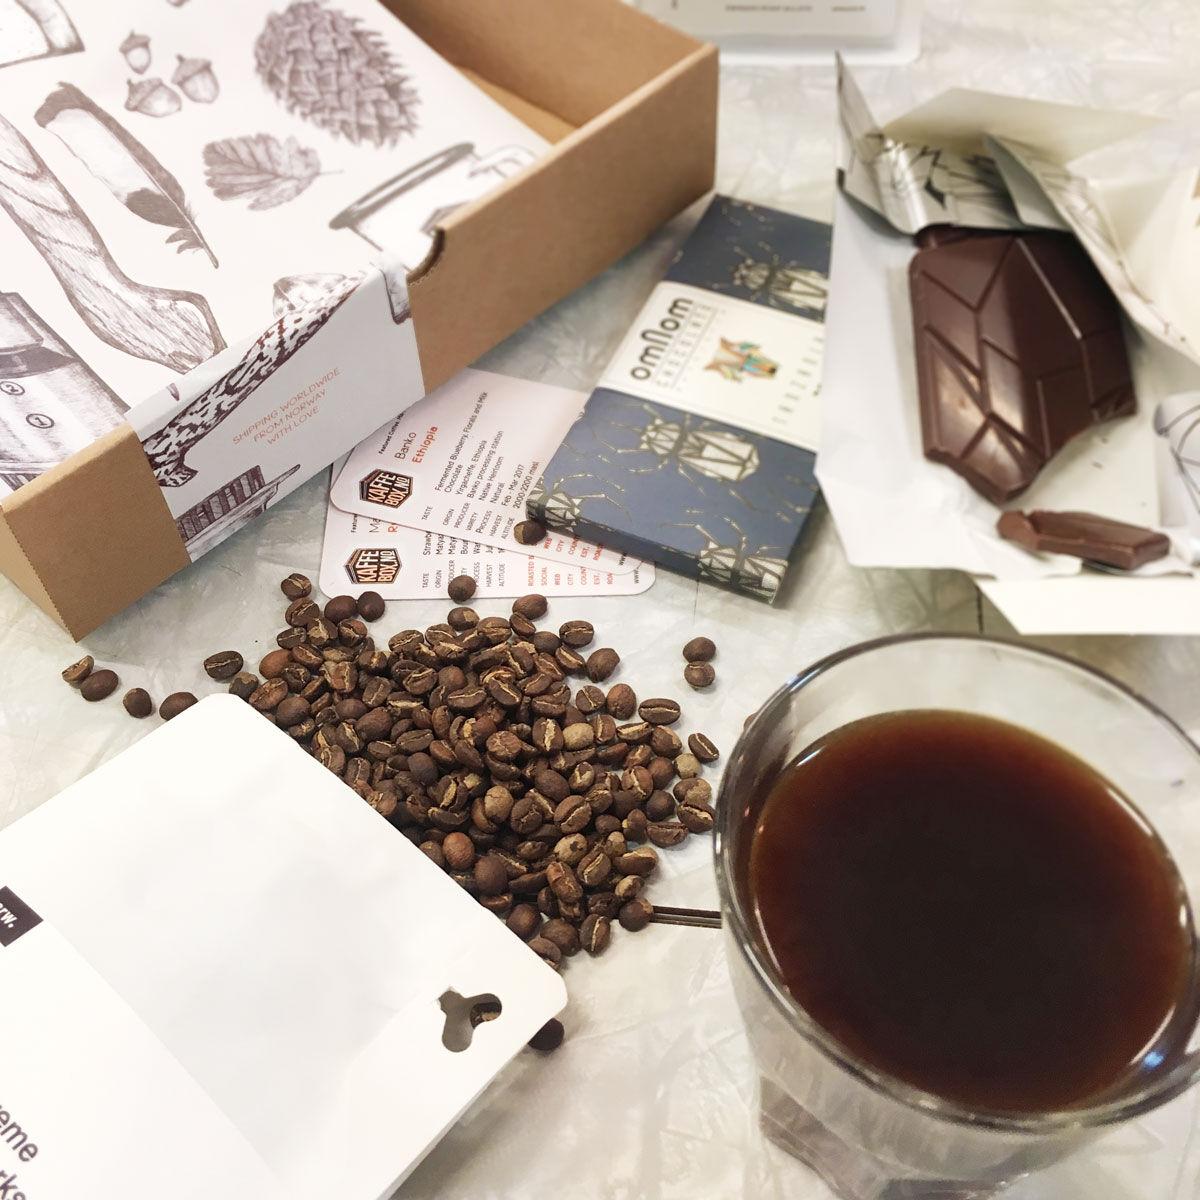 KaffeBox Chocolate Pairing Subscription - 750g, 3 bars